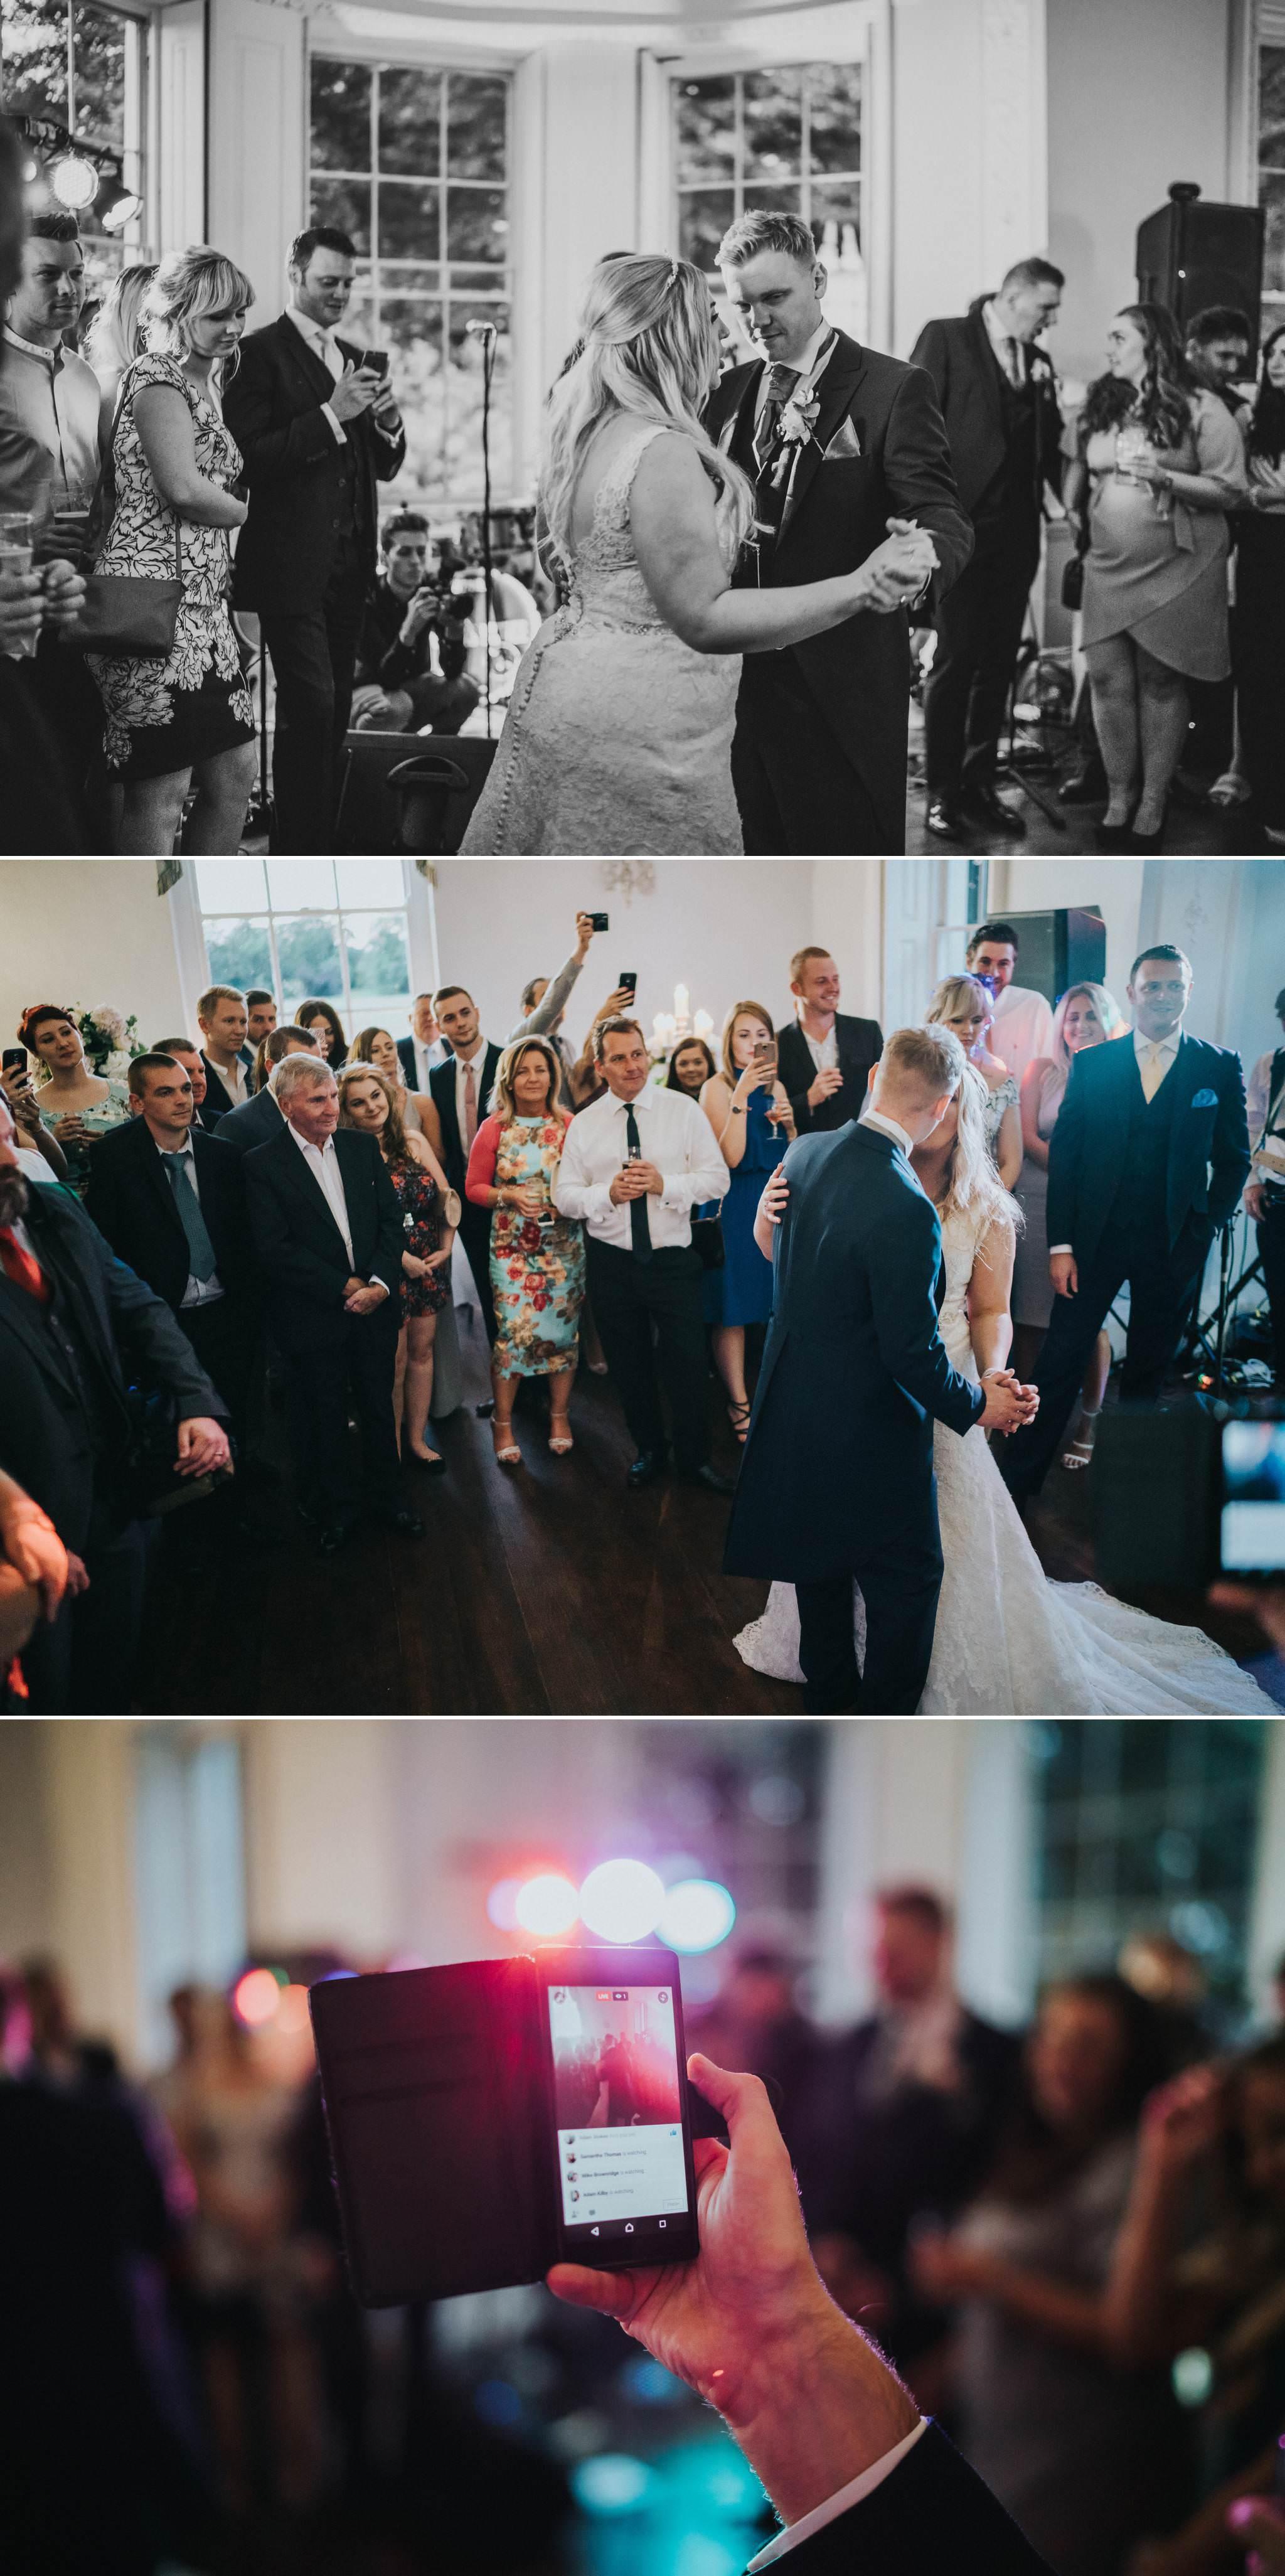 somerford-hall-wedding-photography 22.jpg